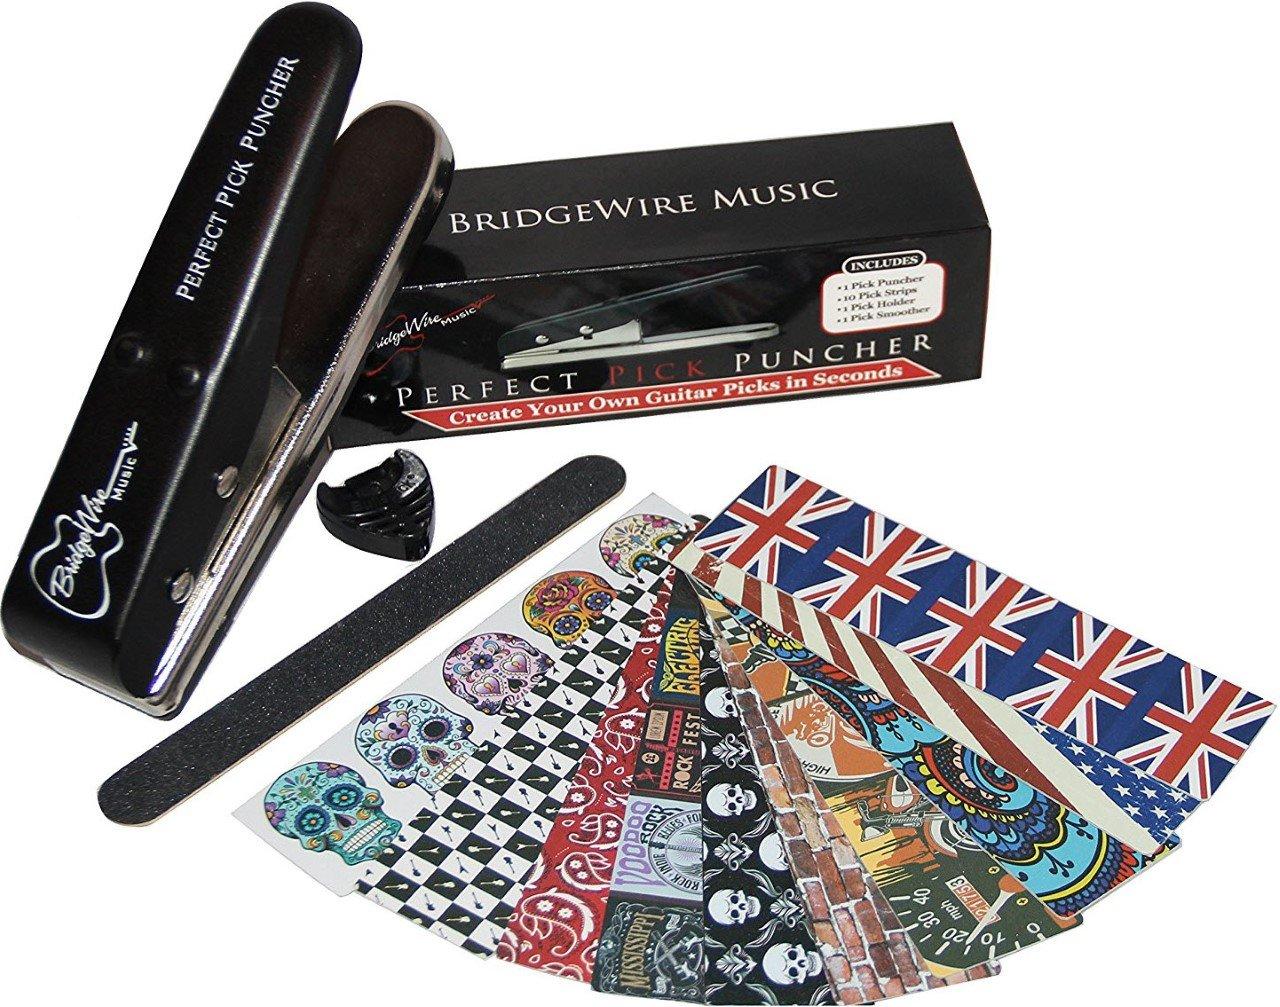 Guitar Pick Punch Seconds BridgeWire Image 1